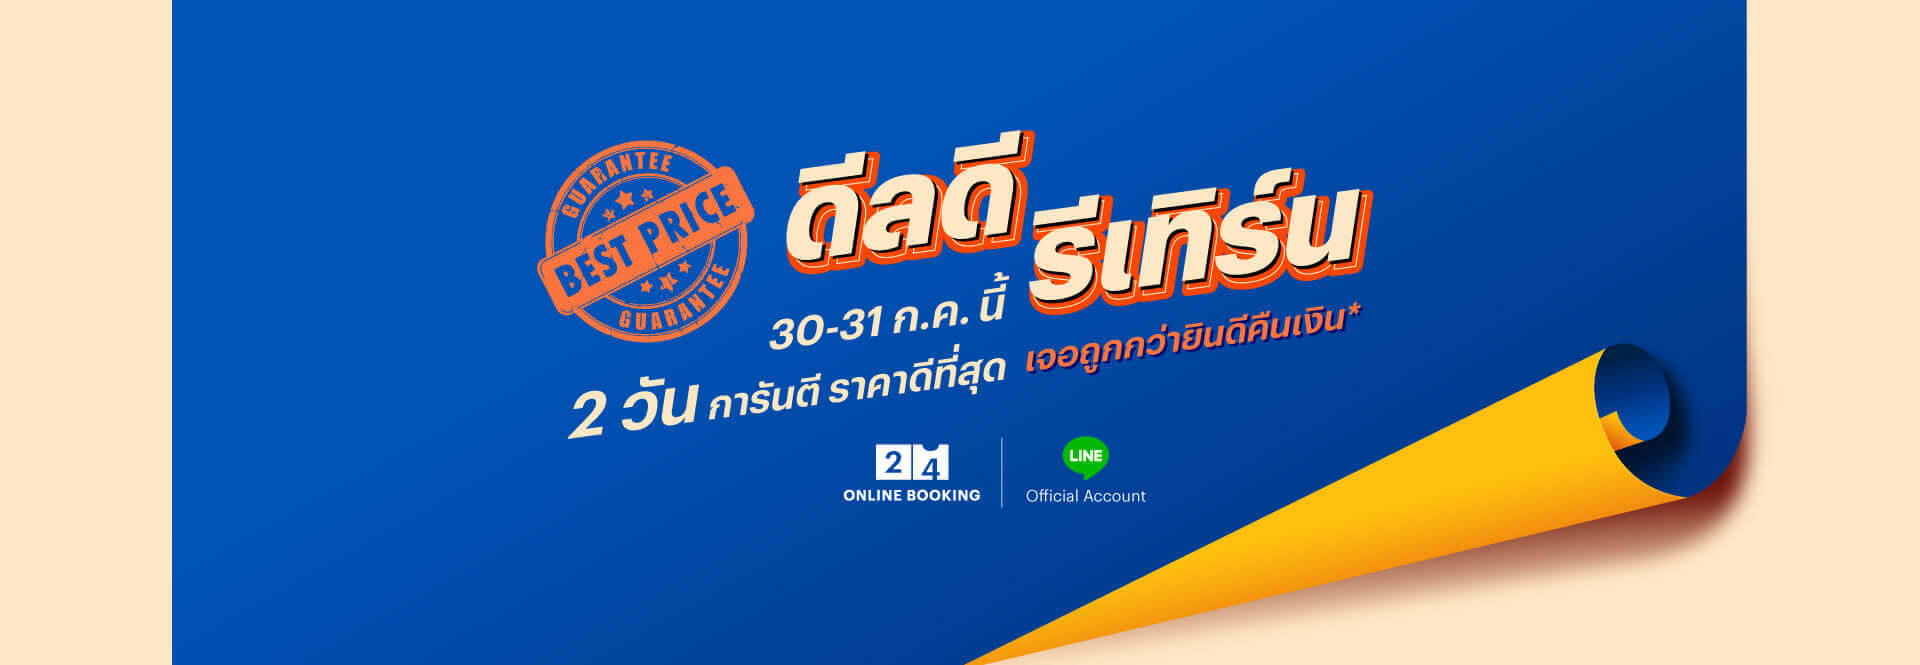 Online Booking Guarantee